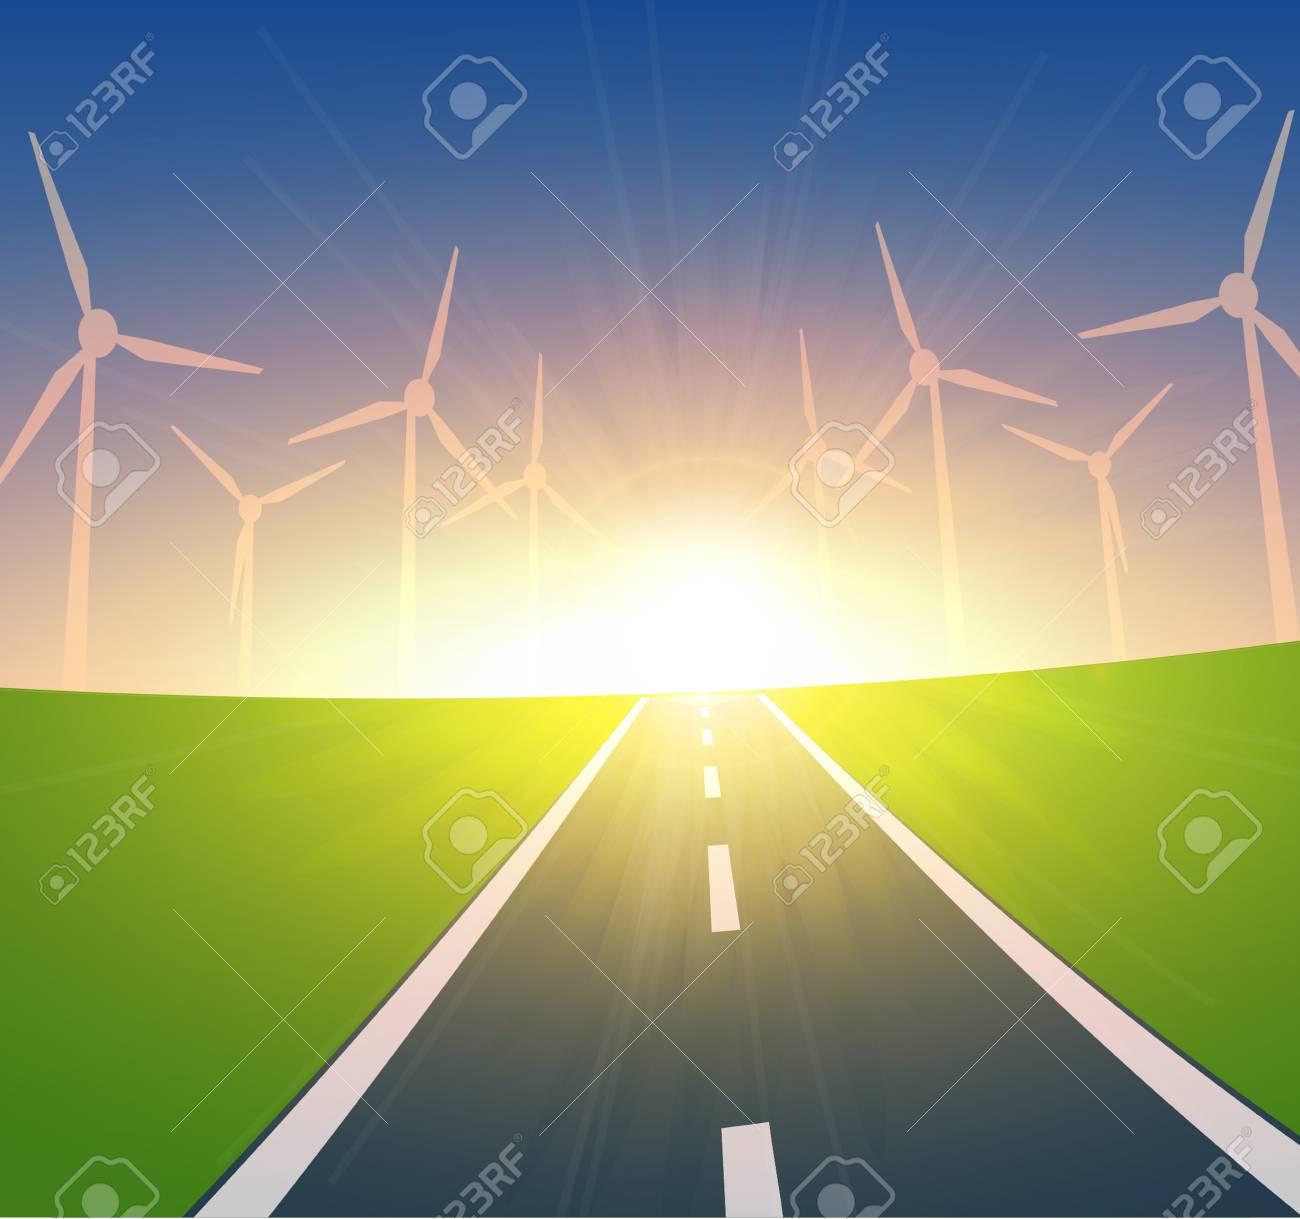 Wind Turbines Landscape Stock Vector - 13478346